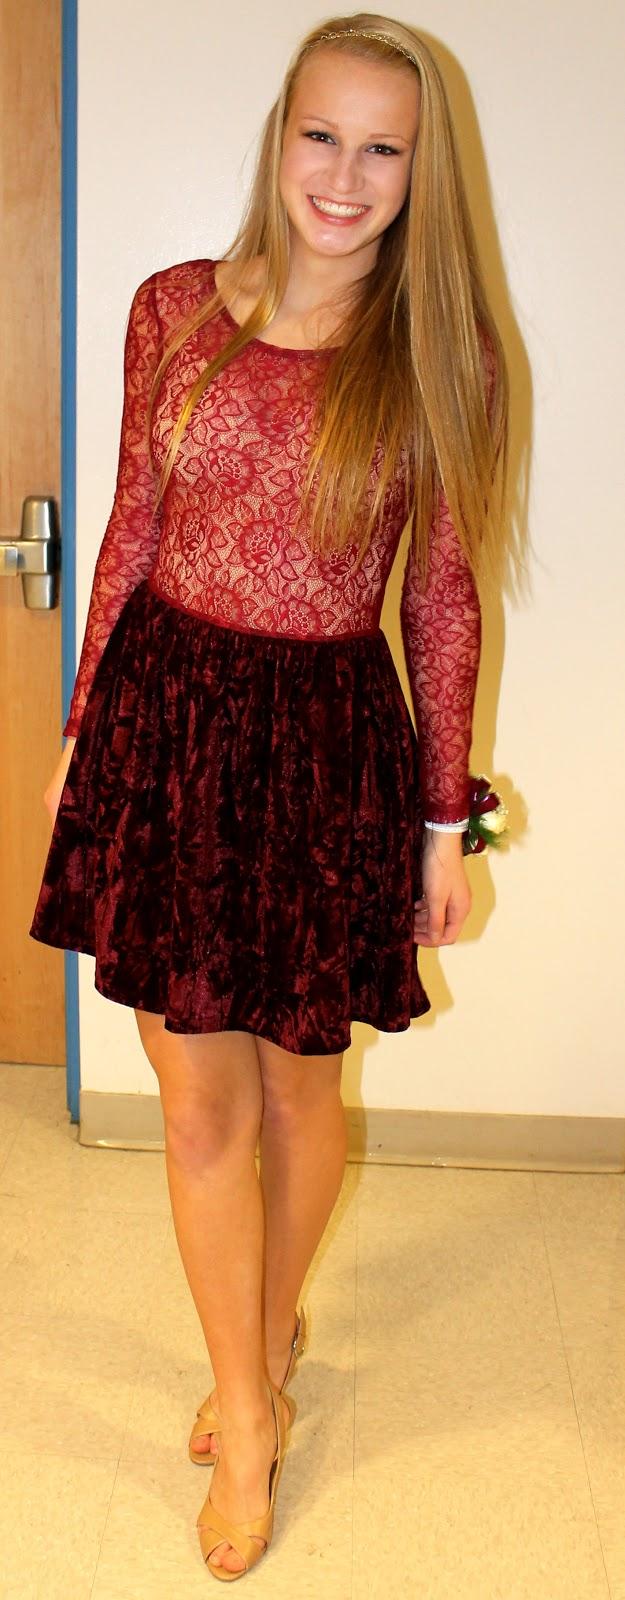 Cute middle school dance dresses christmas dance dress